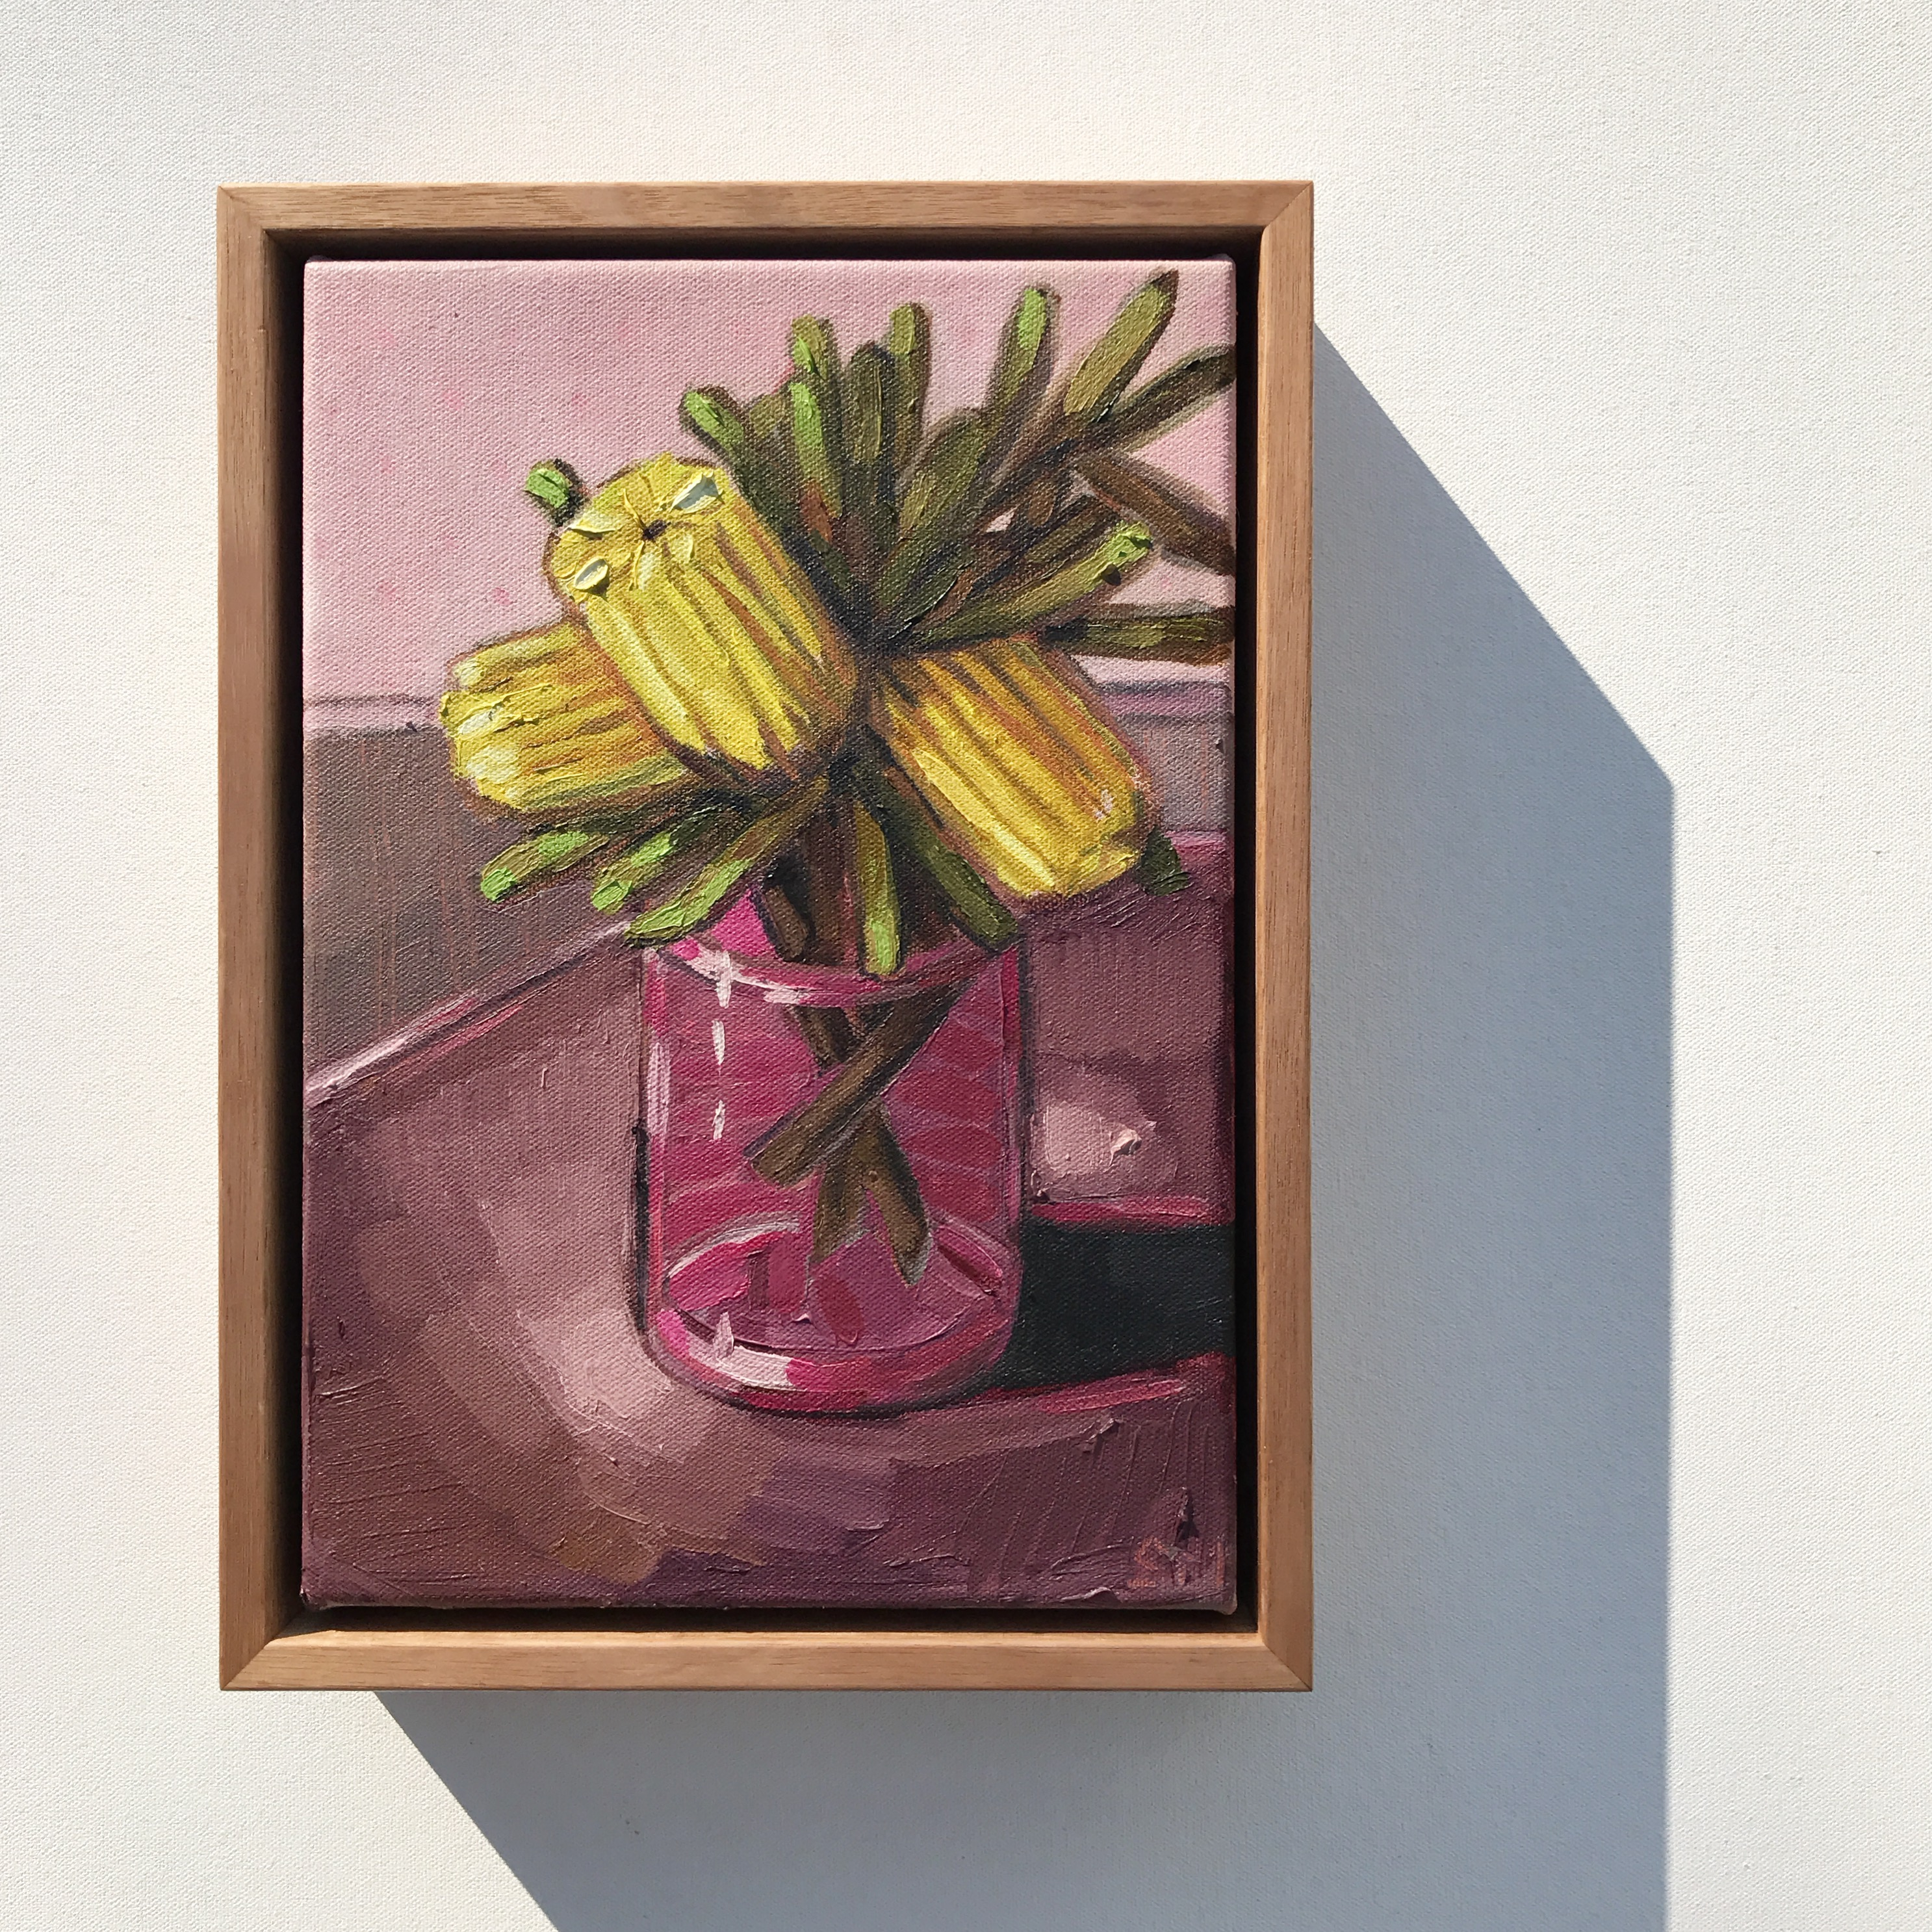 05_17 'Banksias & Burgundy' 21x29cm $395